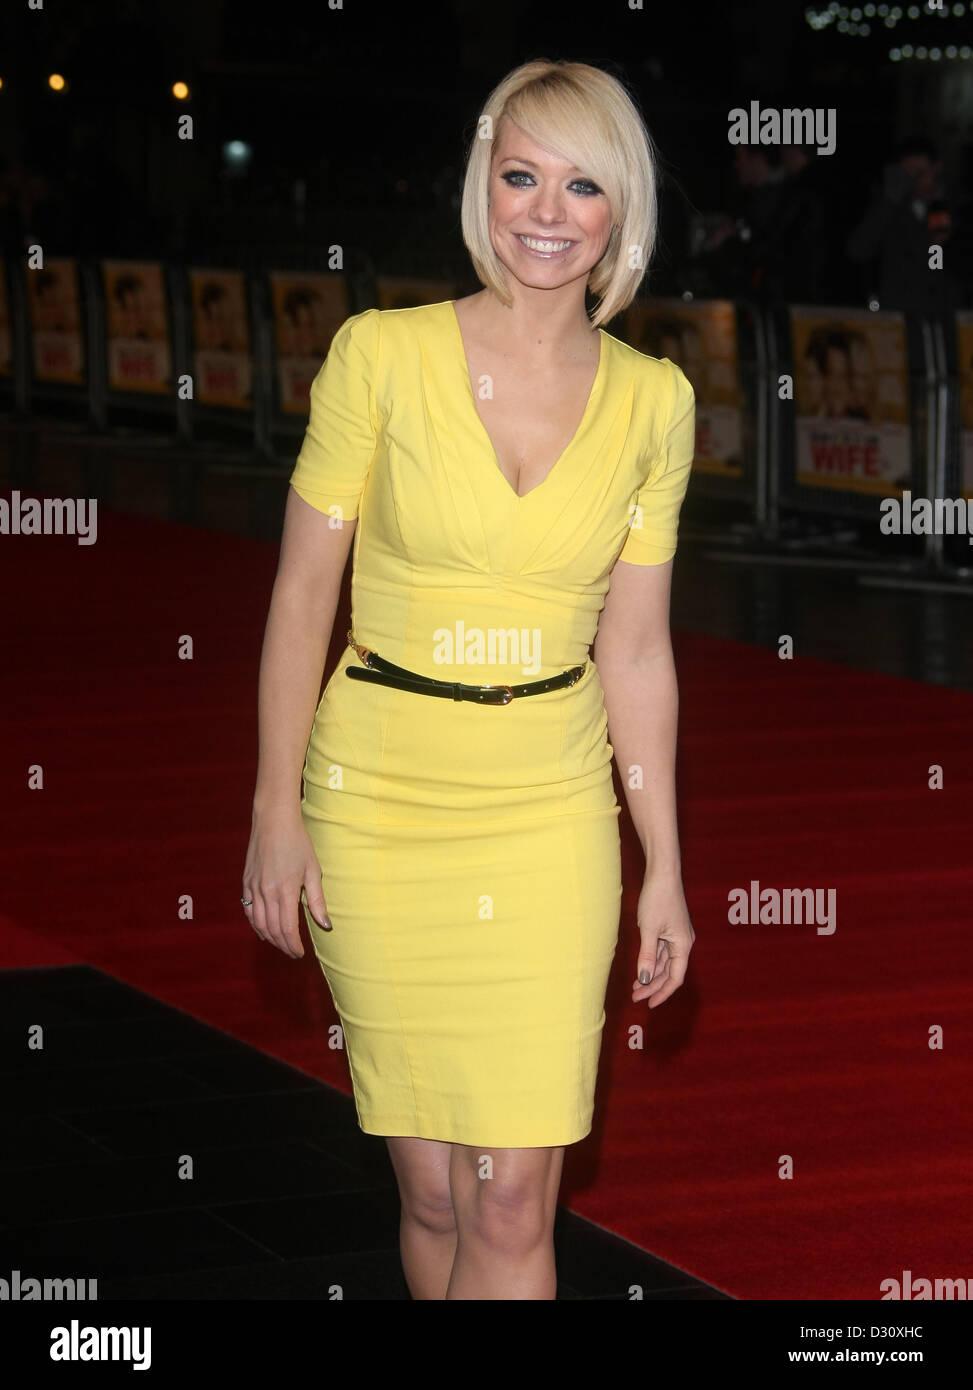 LIZ MCCLARNON RUN FOR YOUR WIFE. FILM PREMIERE LONDON ENGLAND UK 05 February 2013 - Stock Image